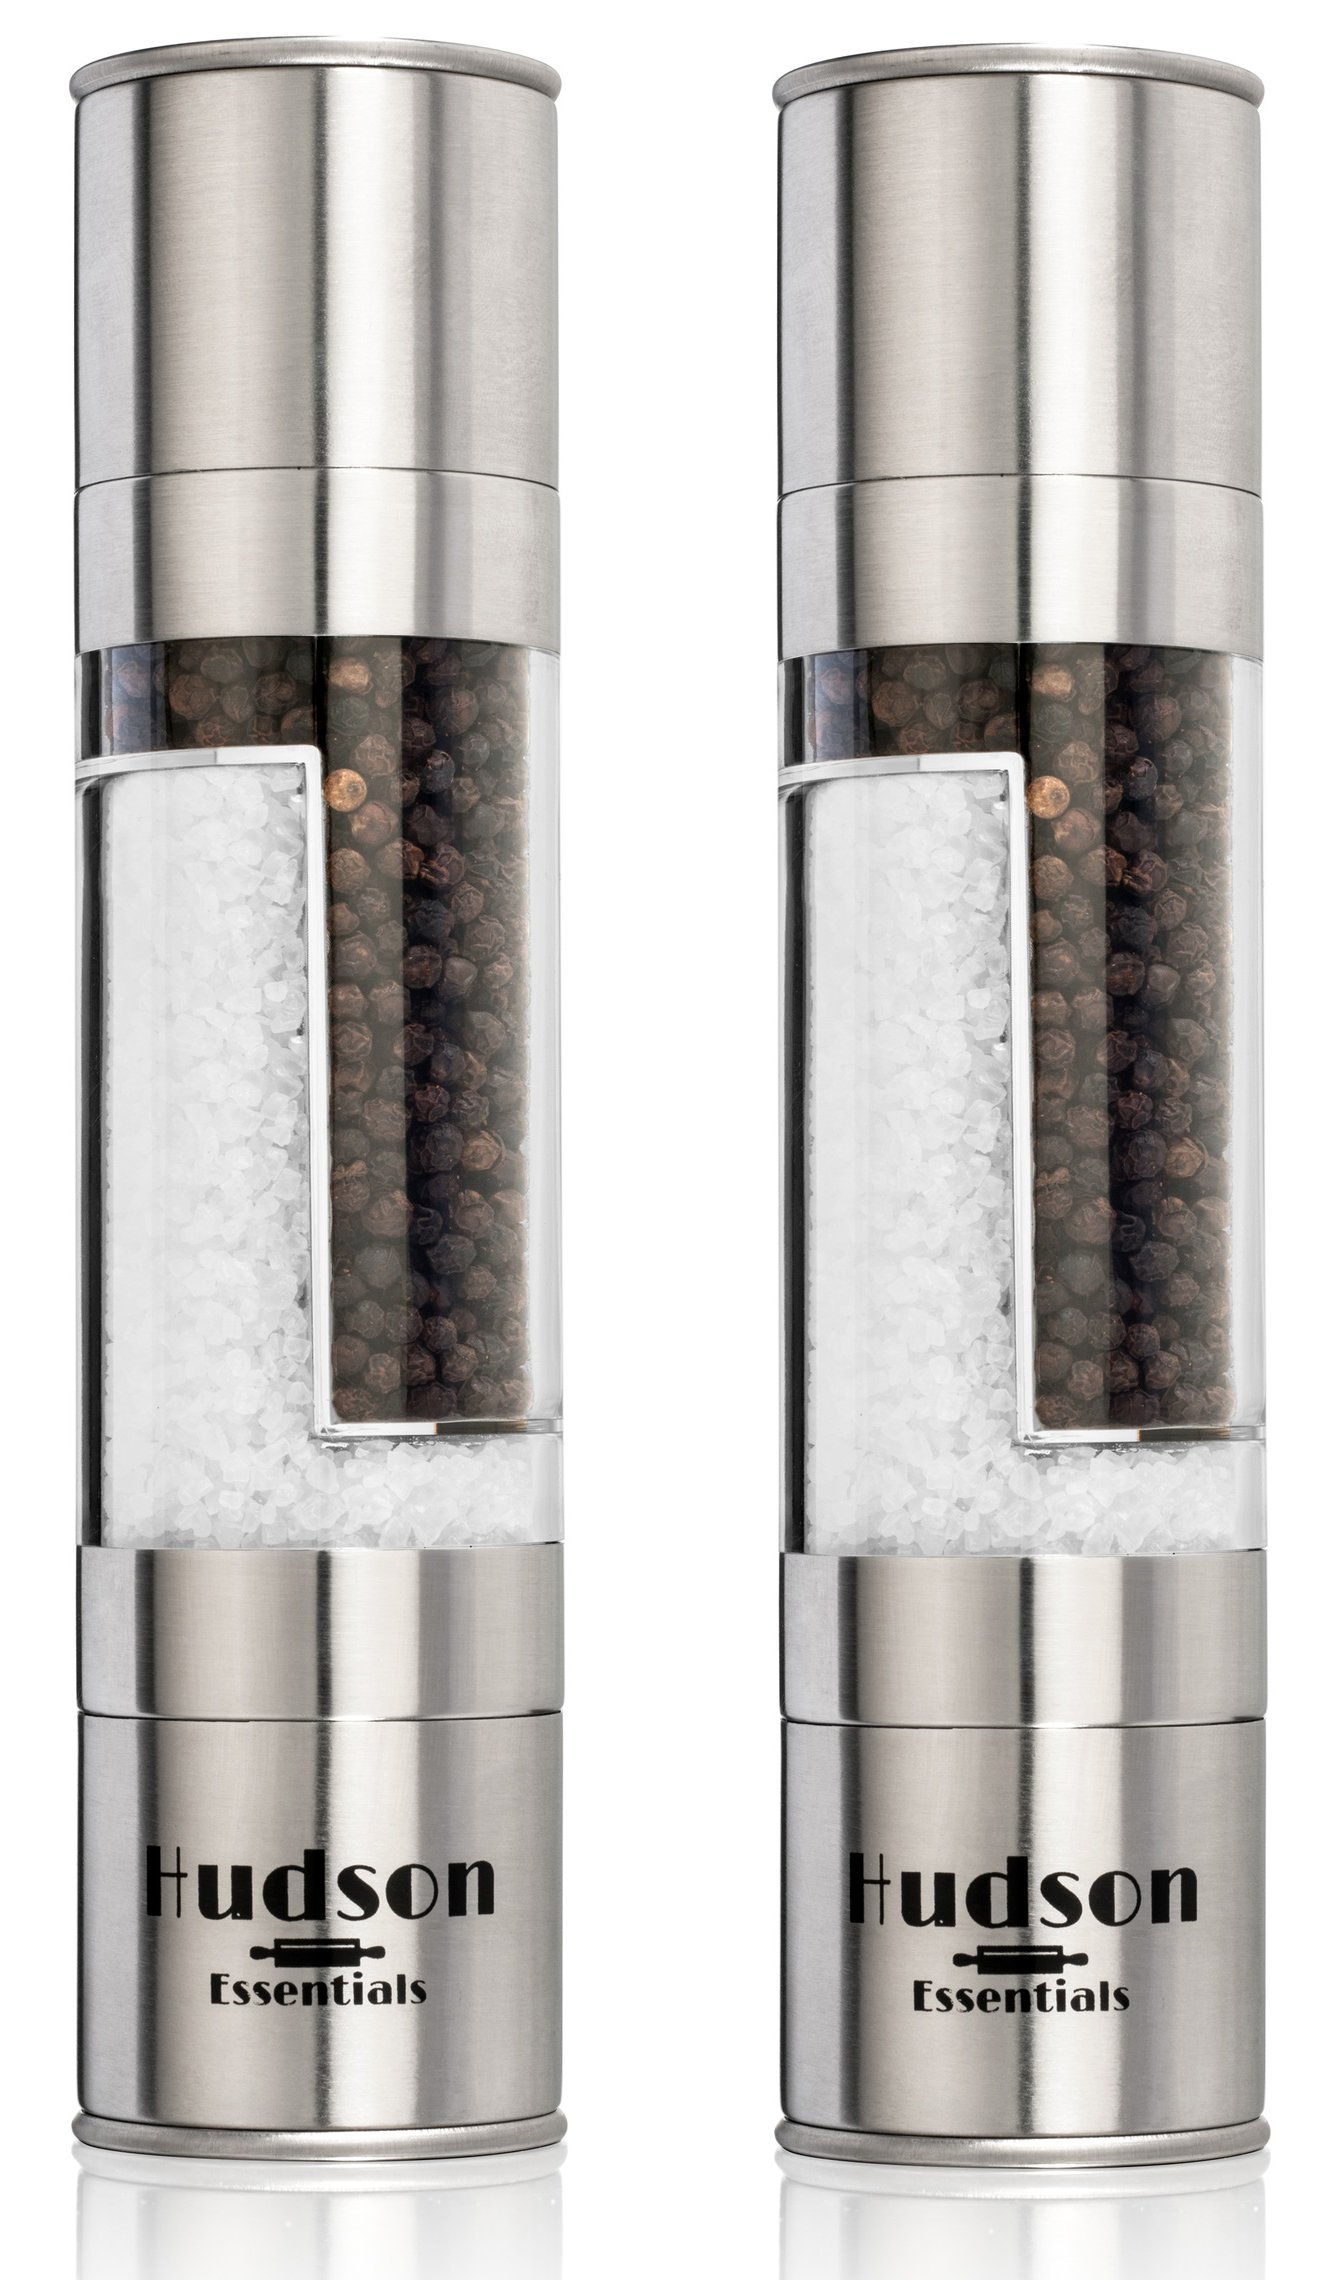 Hudson Deluxe 2 in 1 Salt and Pepper Grinder Set - Ceramic Blade & Stainless Steel - Set of 2 Manual Mills